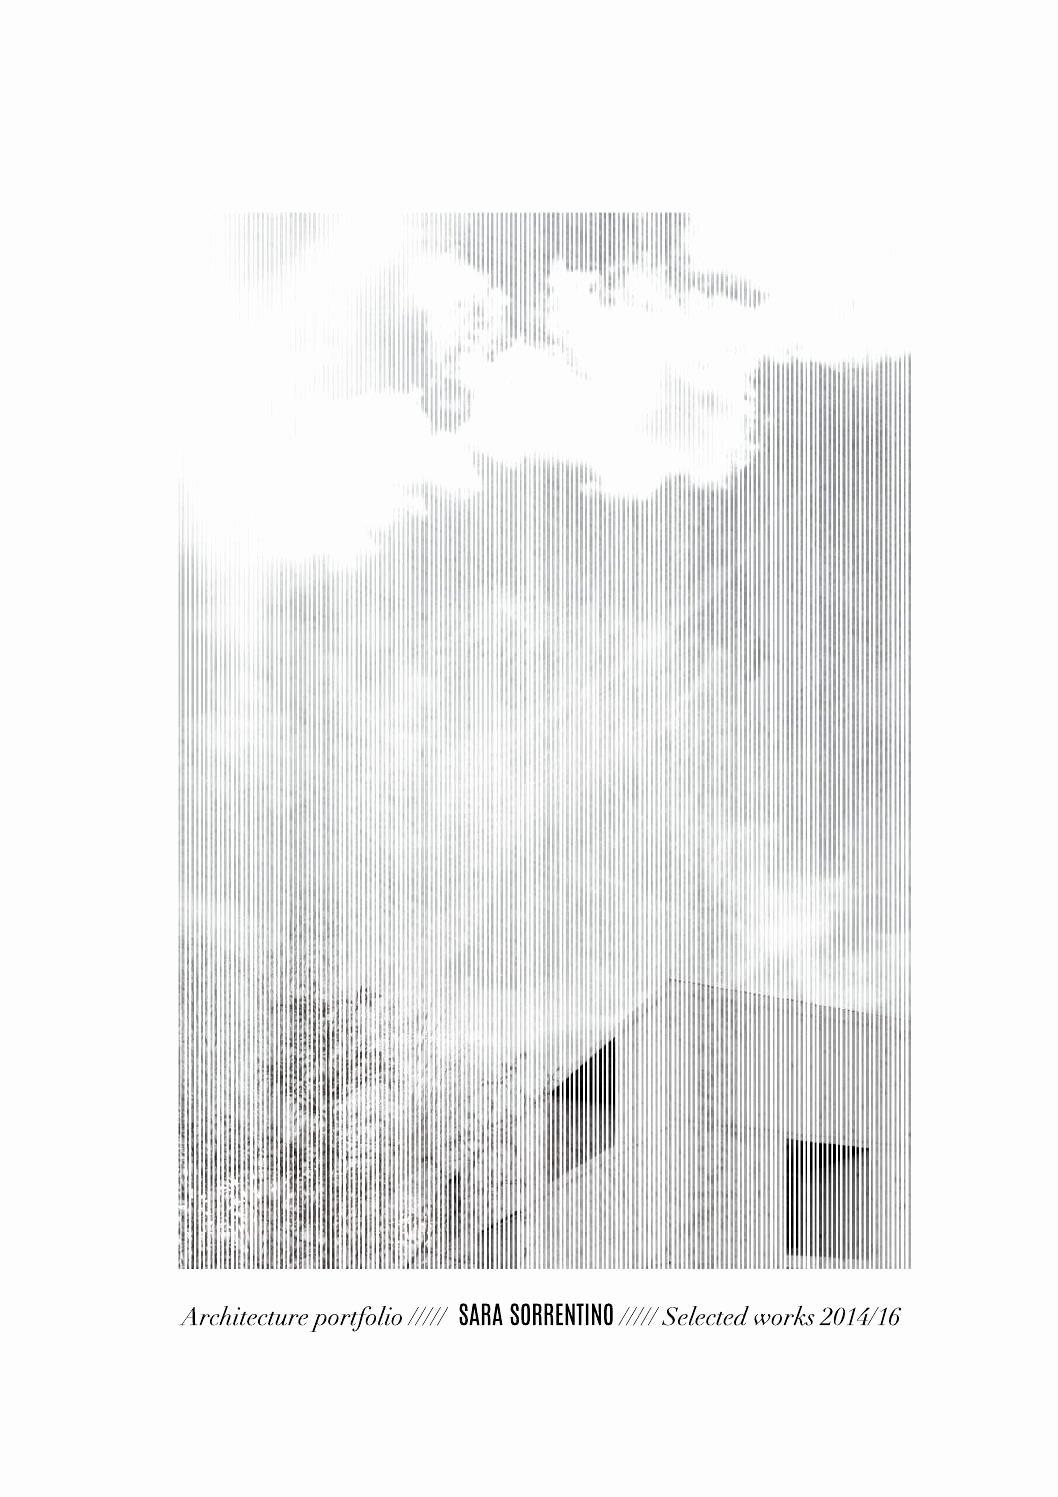 Portfolio Cover Page Template Inspirational Sara sorrentino Architecture Portfolio 2016